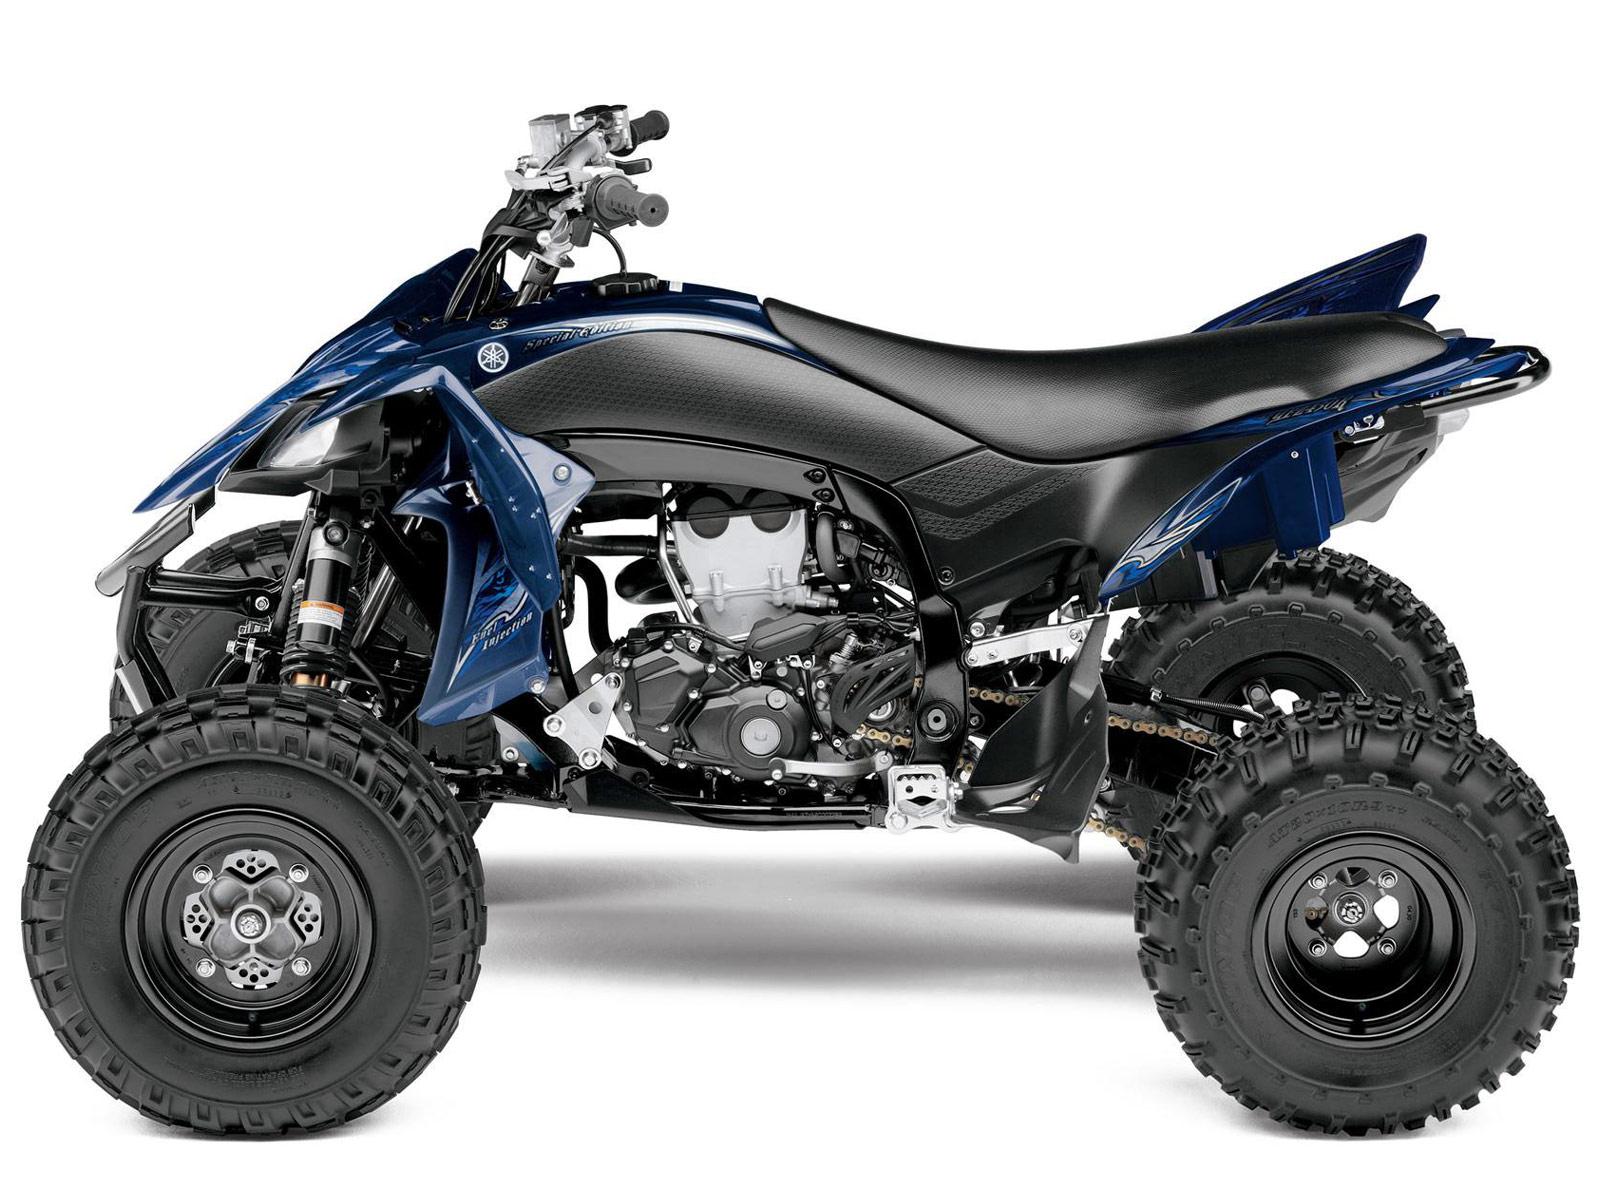 ... 2013 Yamaha Raptor YFZ450R SE ATV pictures 3